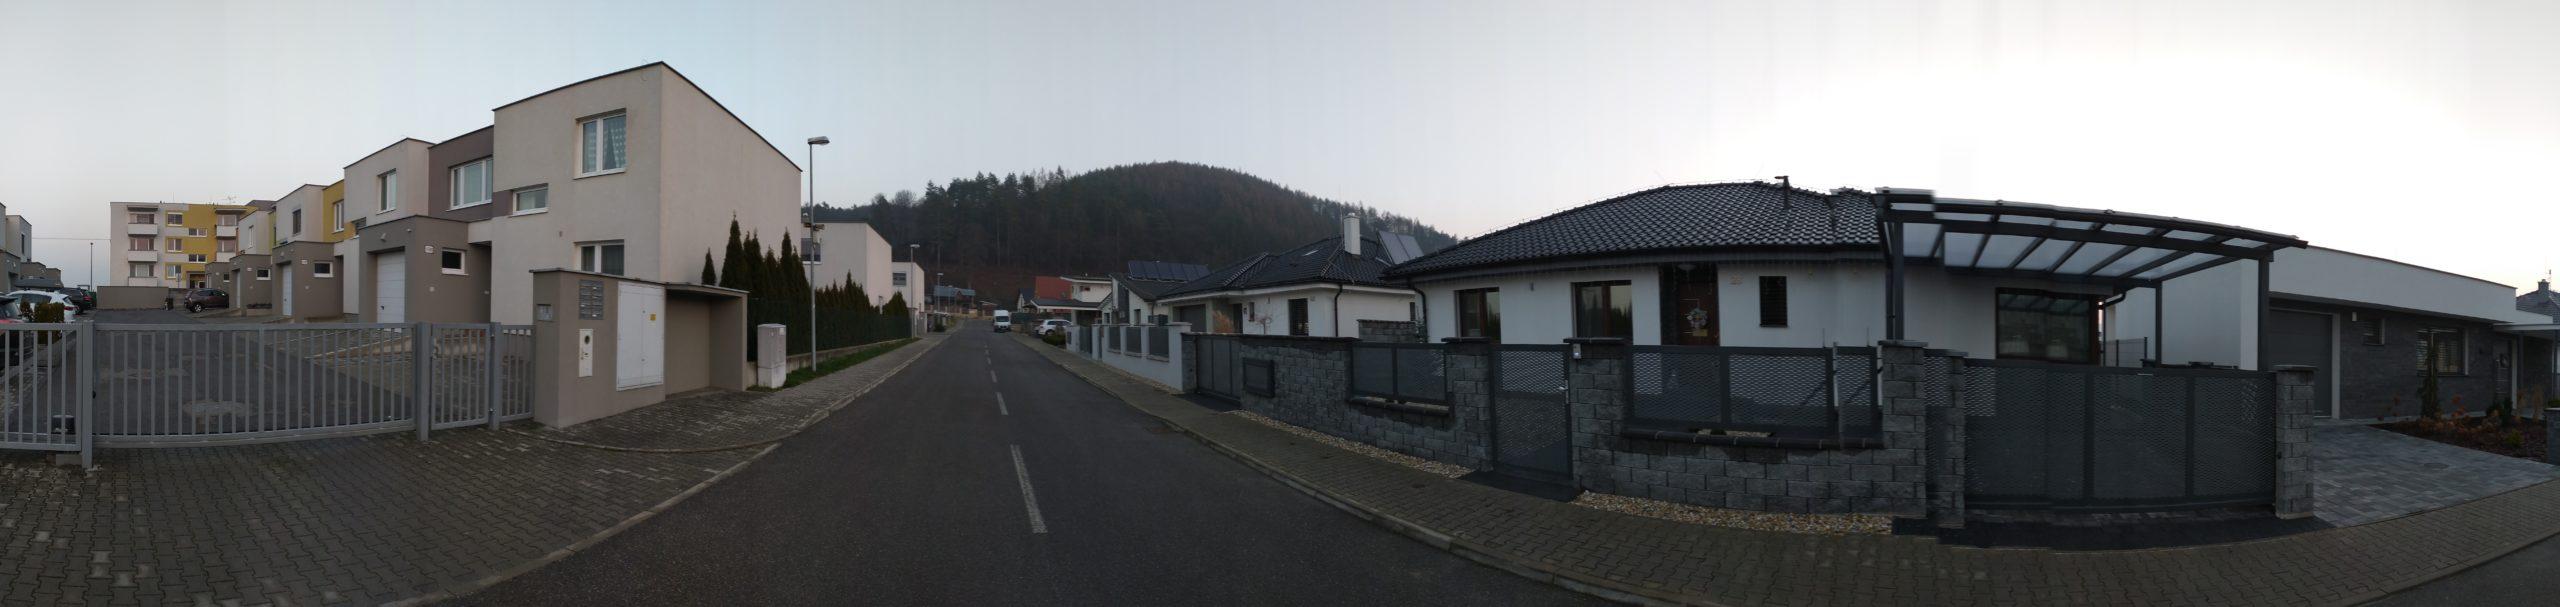 Redmi Note 8T panorama